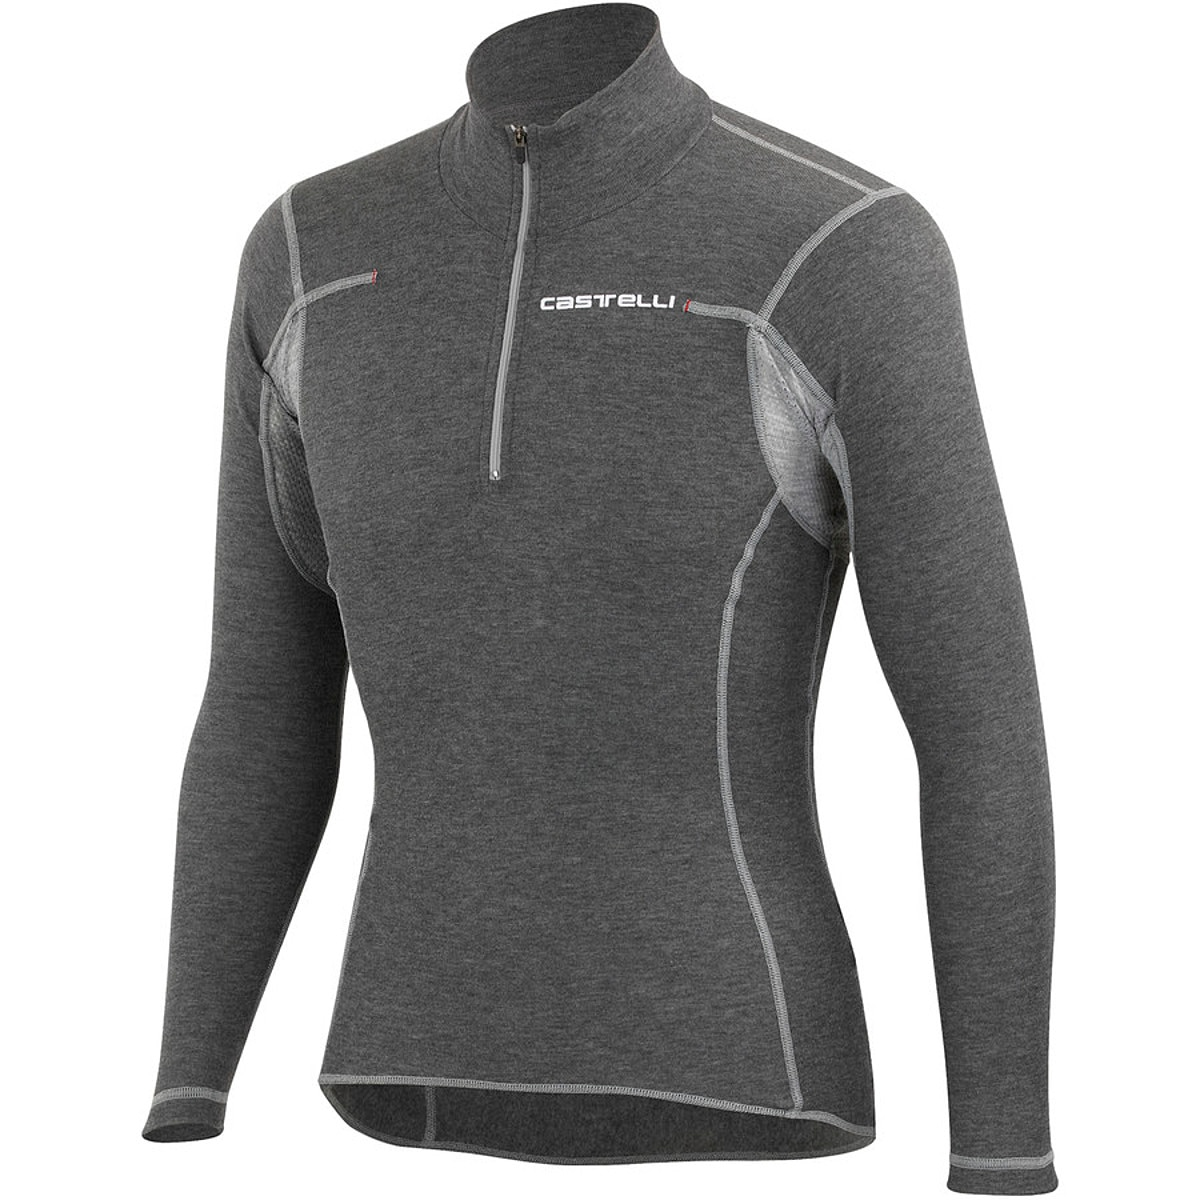 Castelli Flanders Warm Half-Zip Base Layer - Long Sleeve - Men's ...